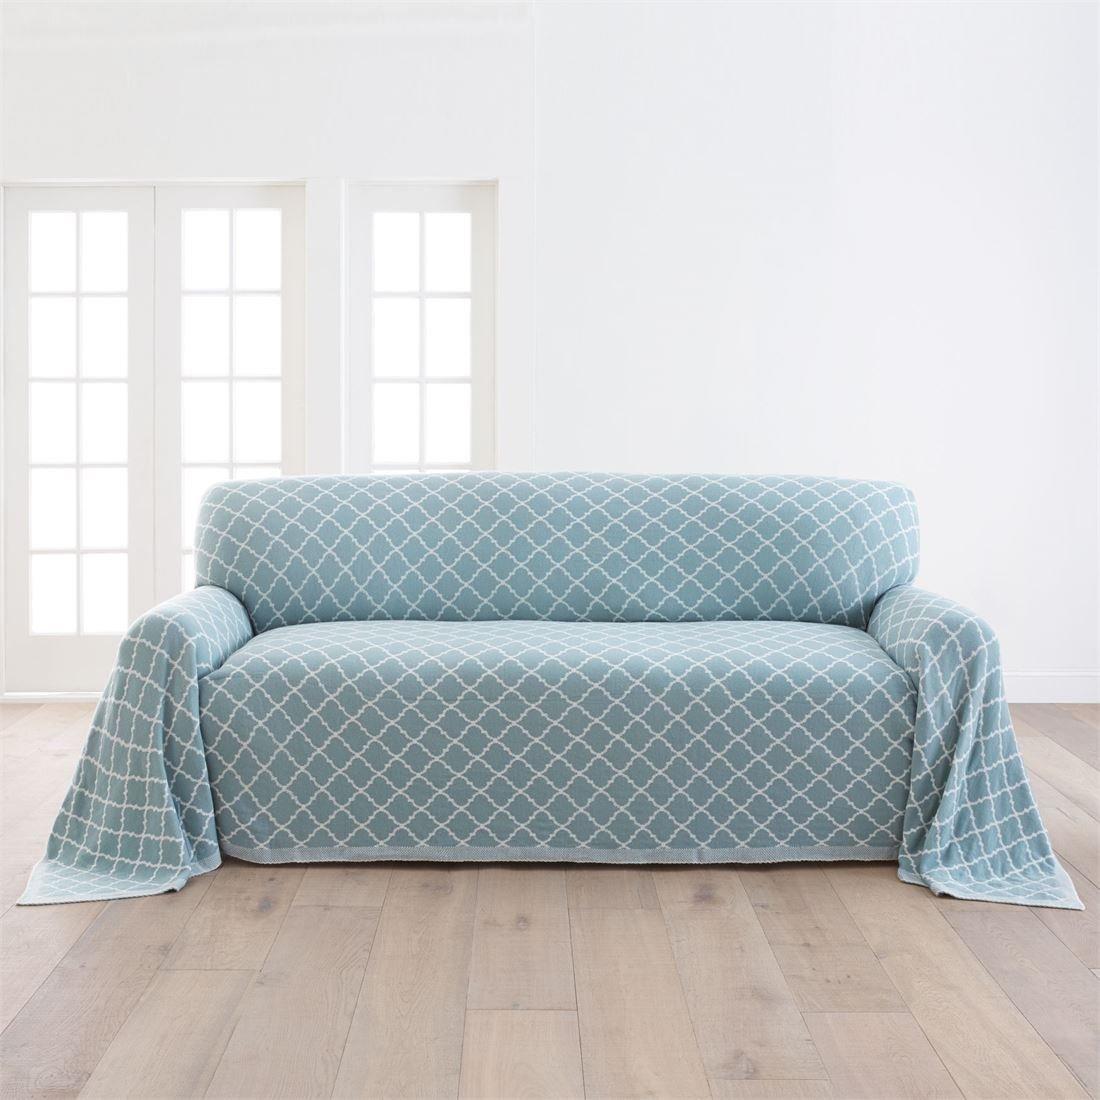 BrylaneHome Ogee Knitted Sofa Cover (Spa, 0)